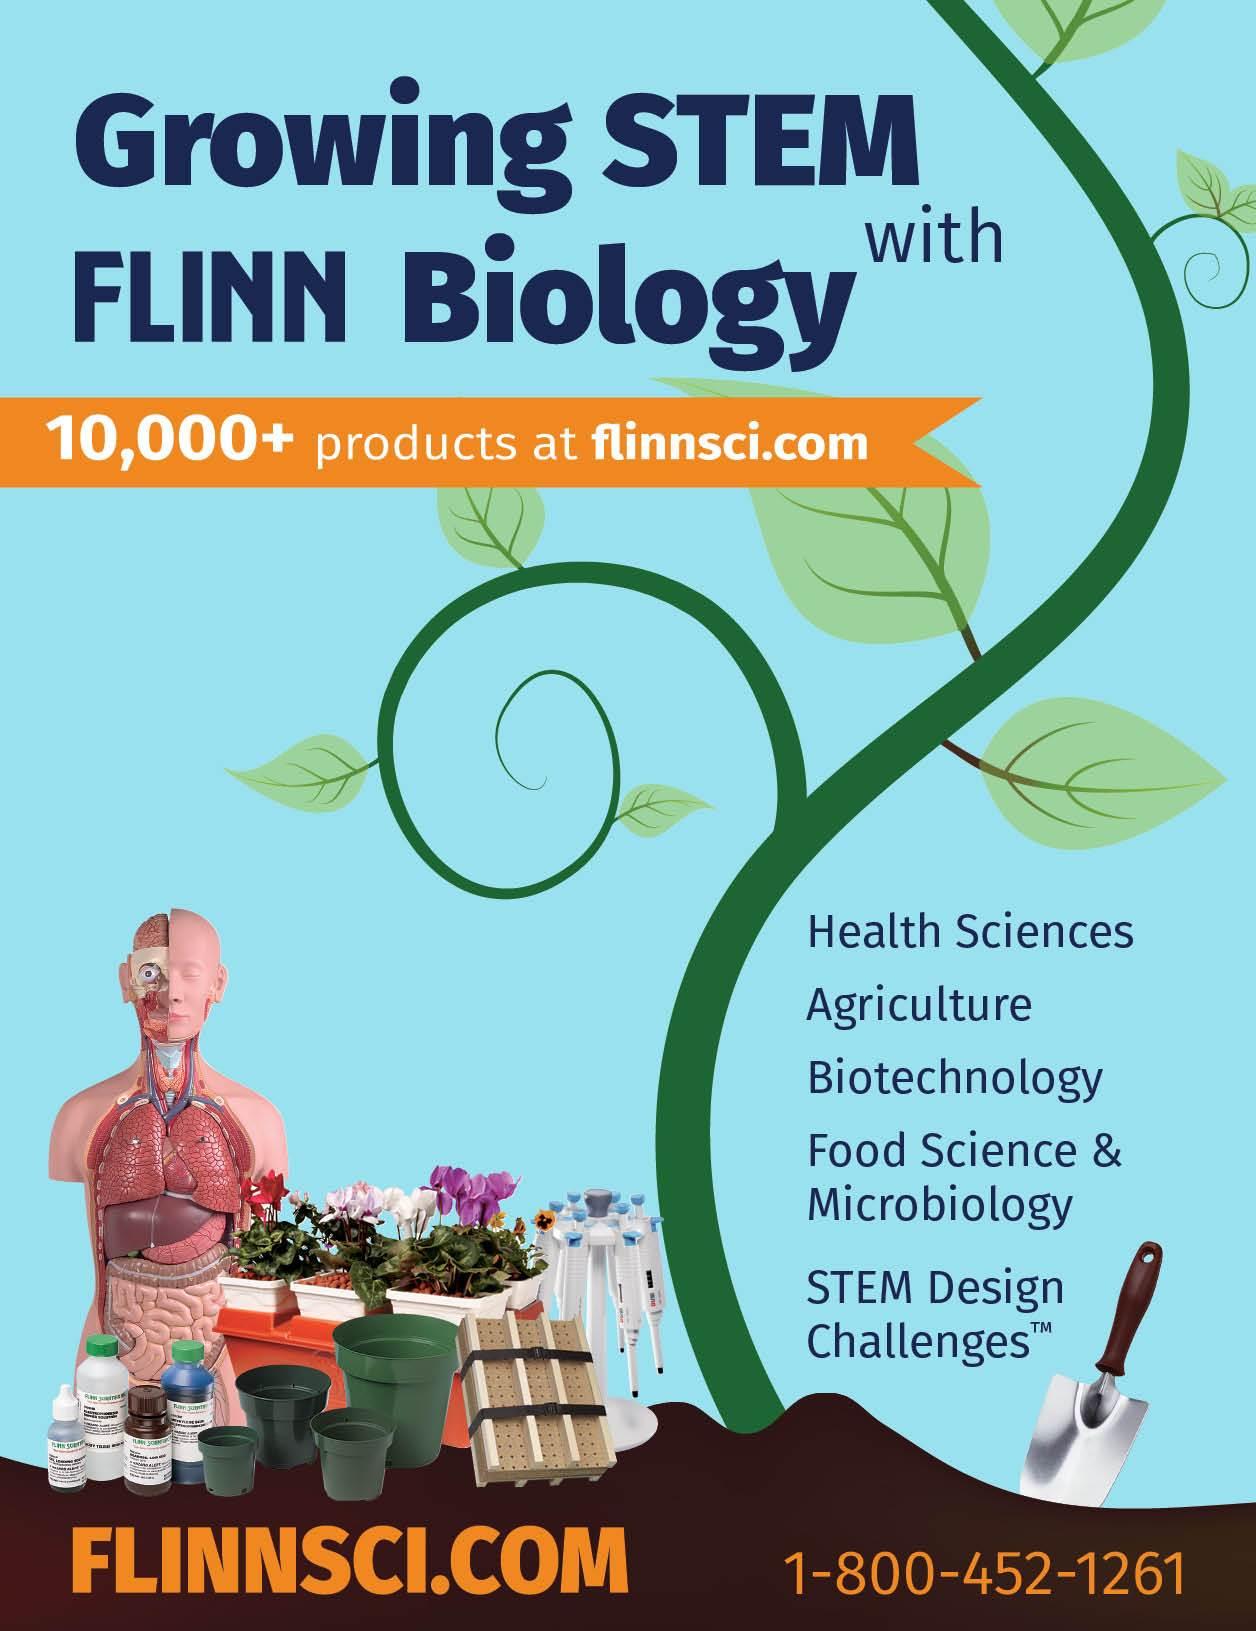 Growing STEM with Flinn Biology Mini Catalog